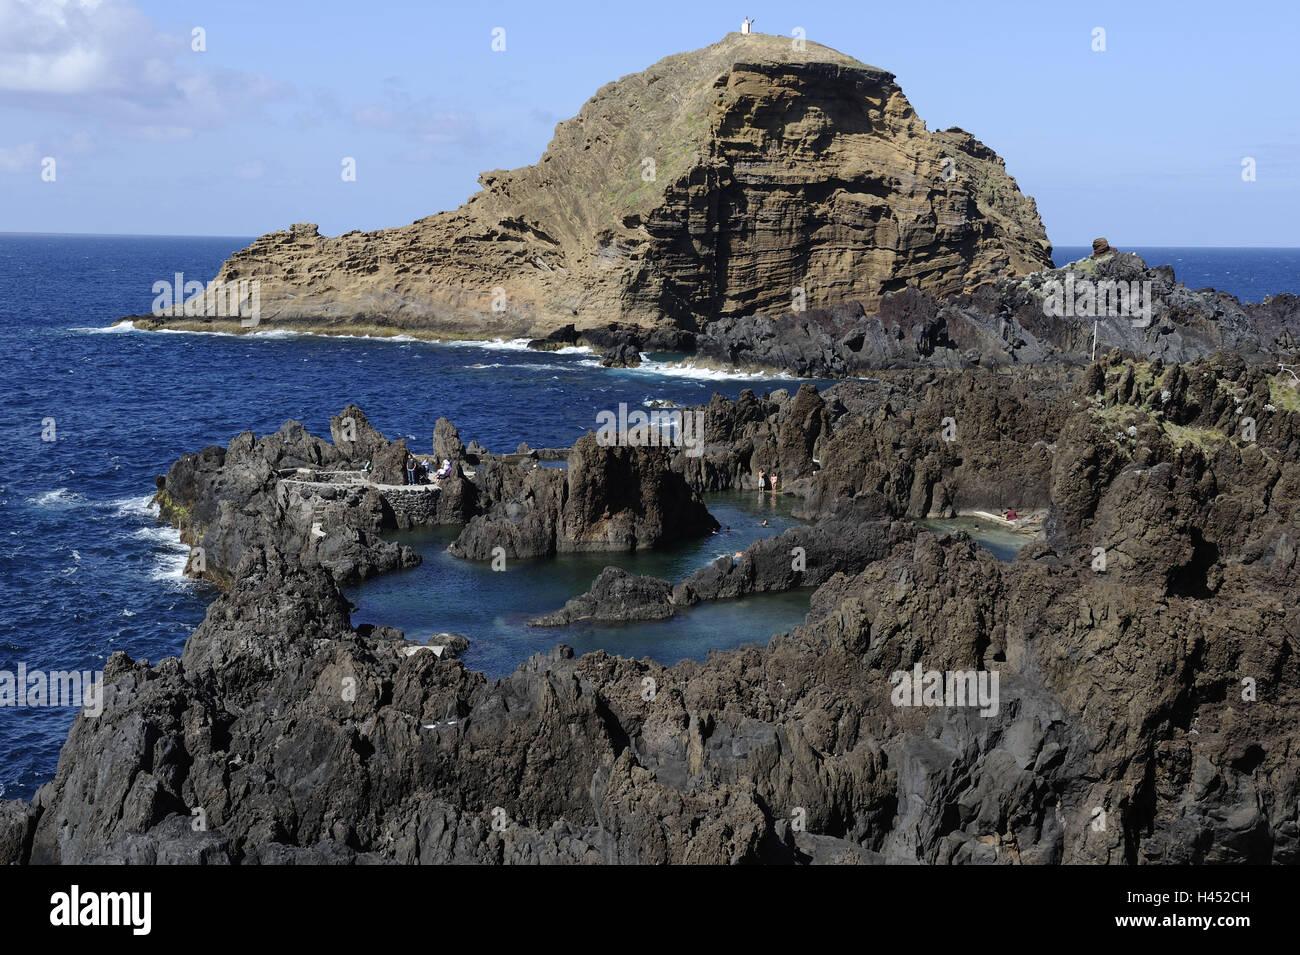 Portugal, island Madeira, postage Moniz, bile coast, - Stock Image